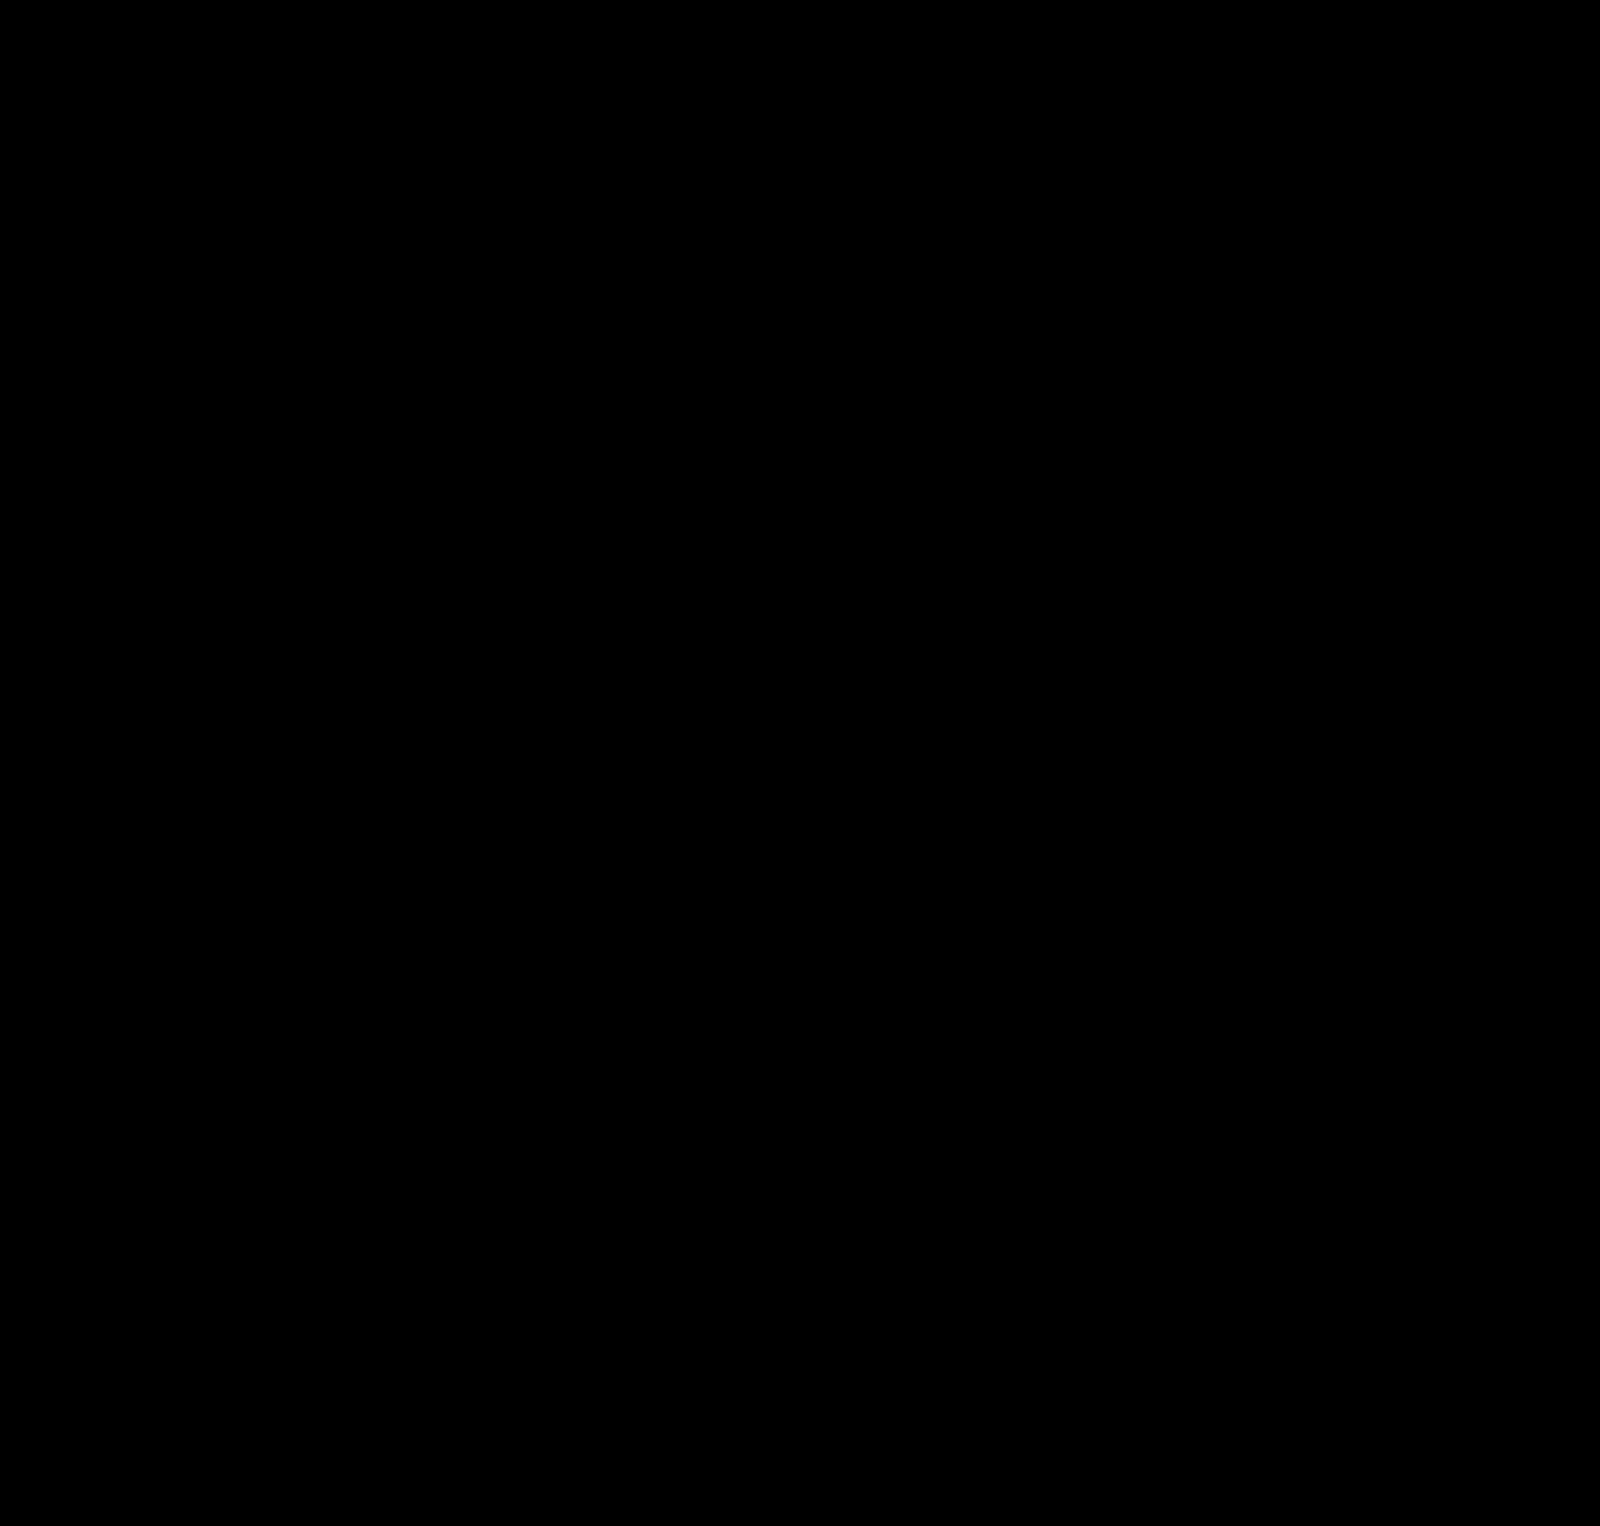 Brown Clip Art Dog SVG Clip arts